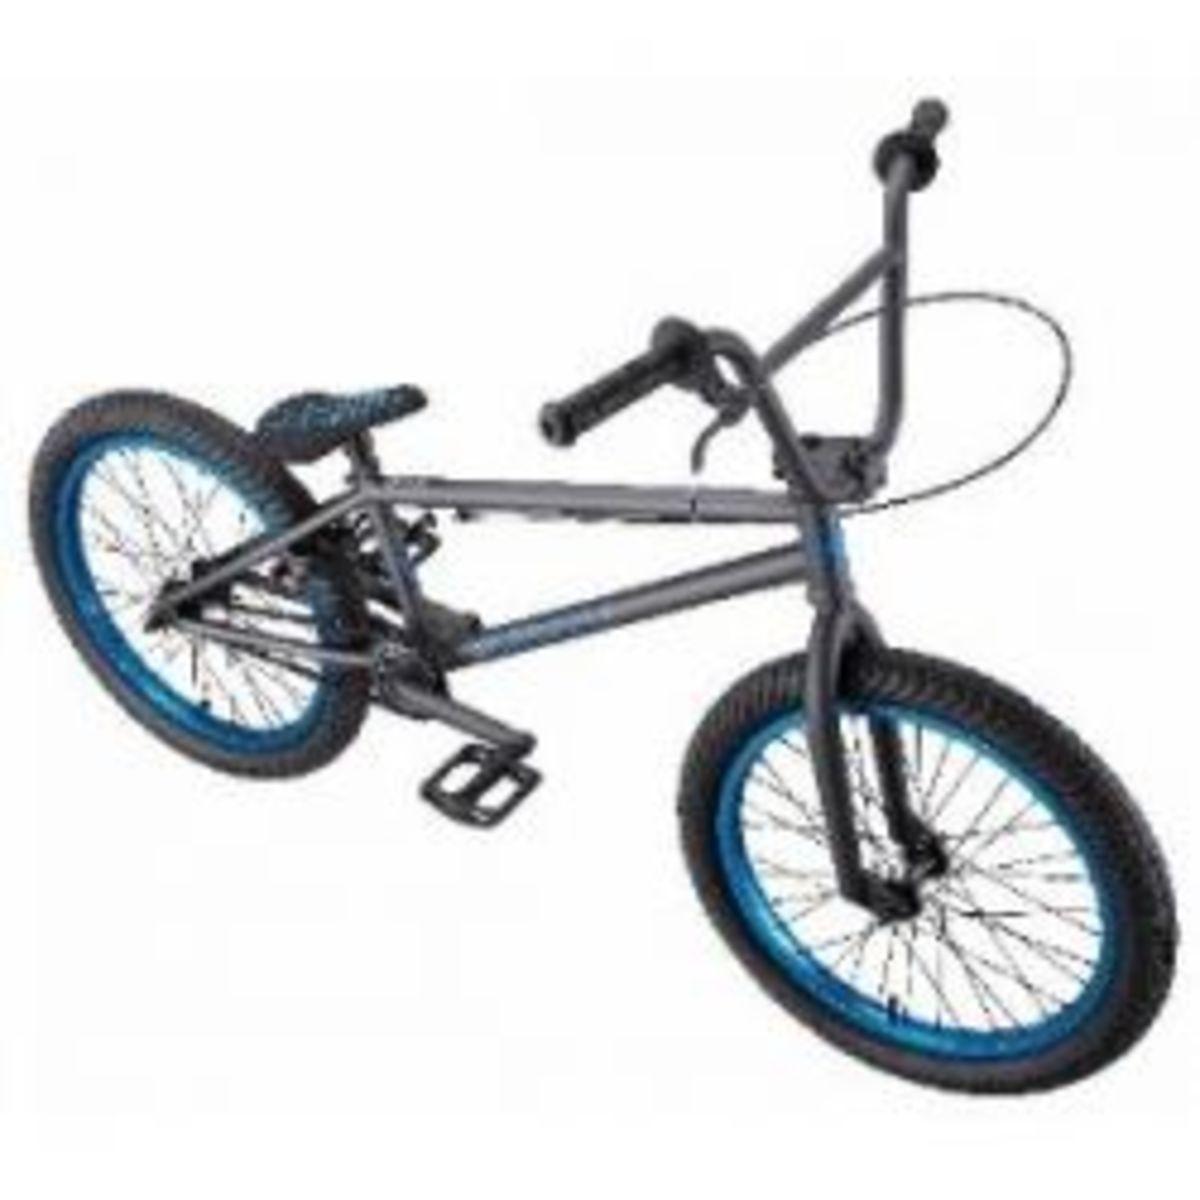 Eastern Bikes Shovelhead BMX Bike